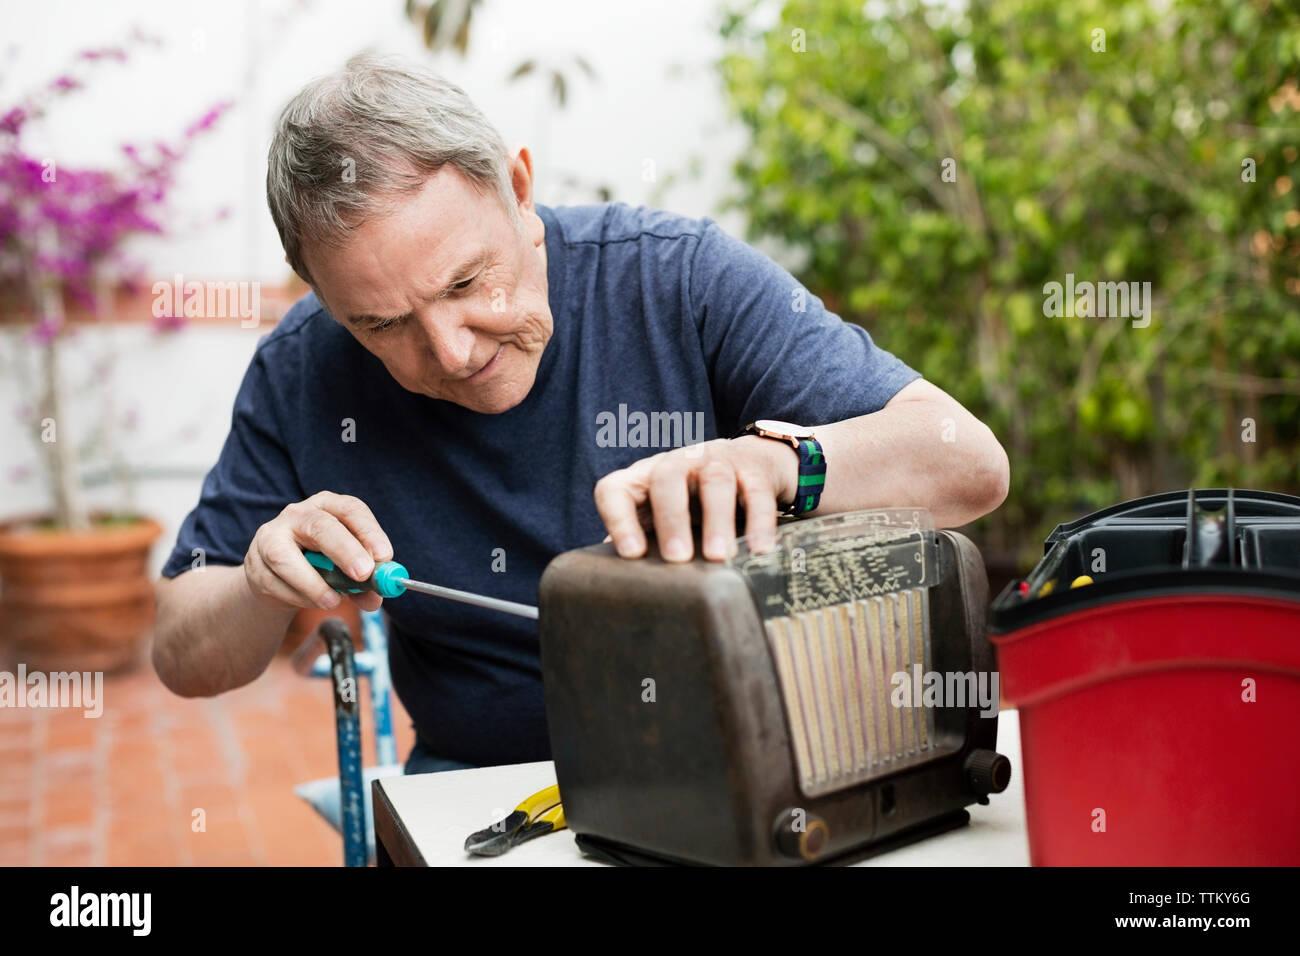 Senior man repairing old-fashioned radio at yard Stock Photo